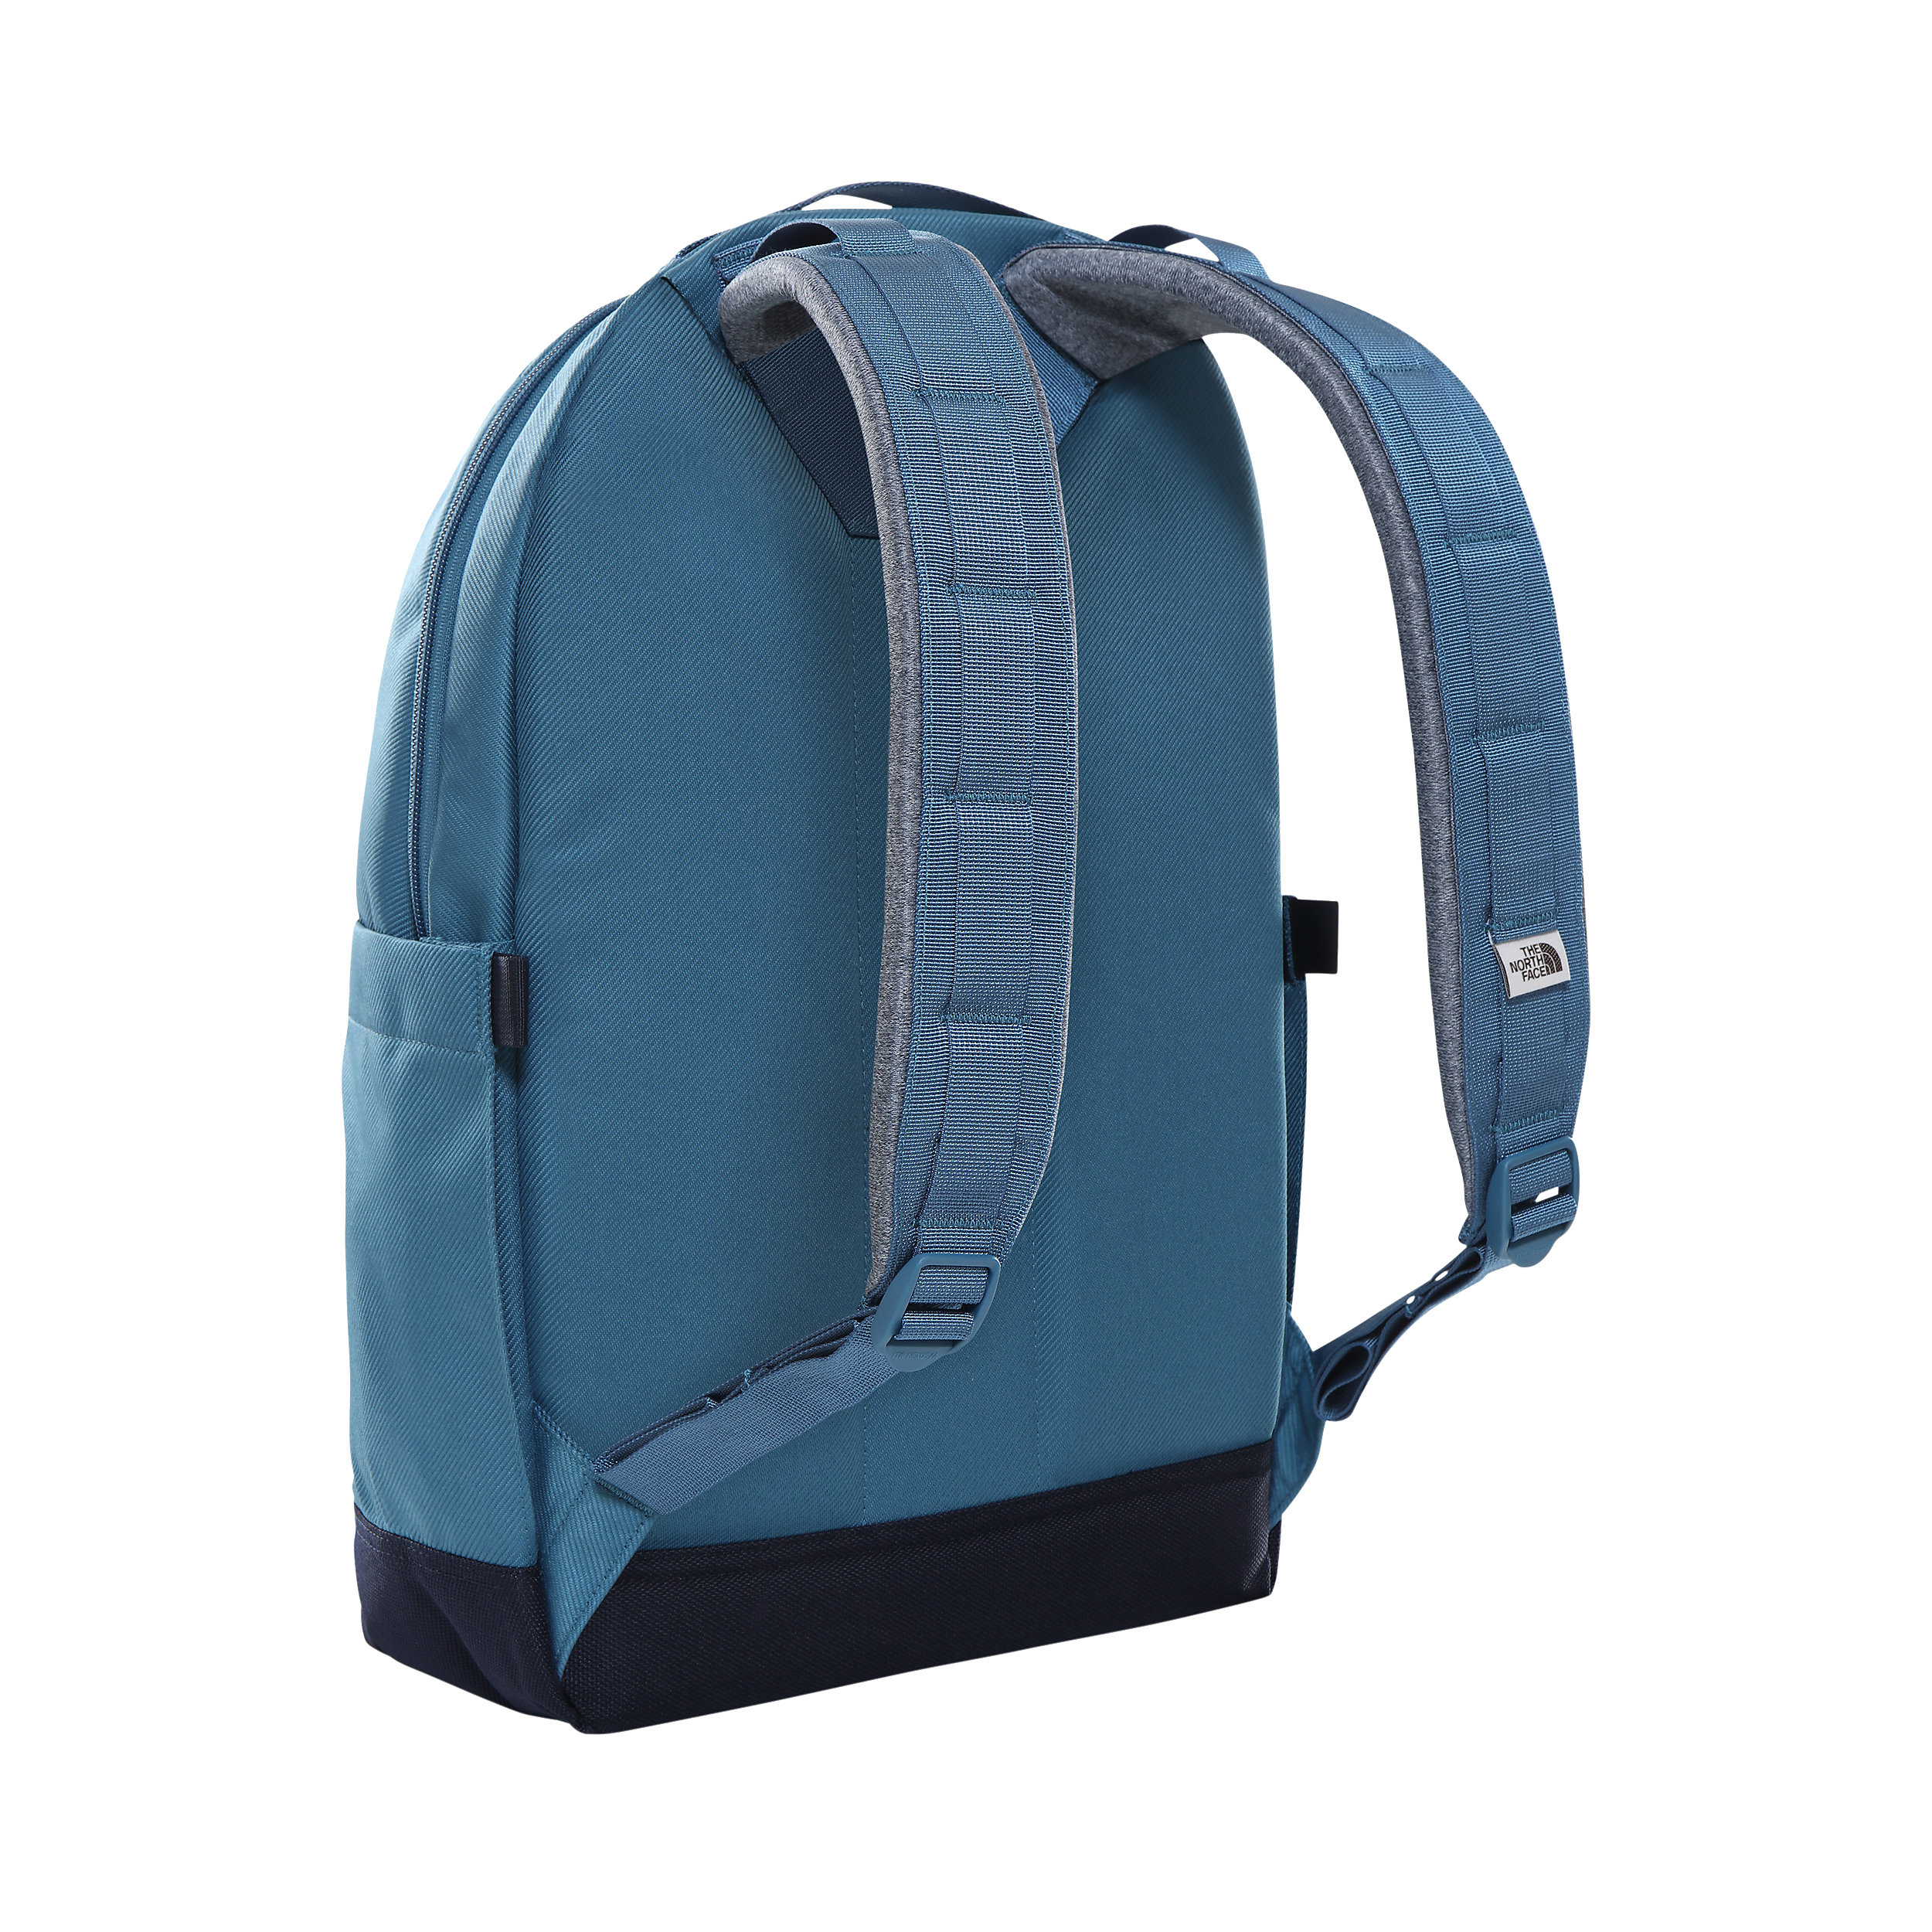 Backpack Daypack 17 inch M 22 Liter